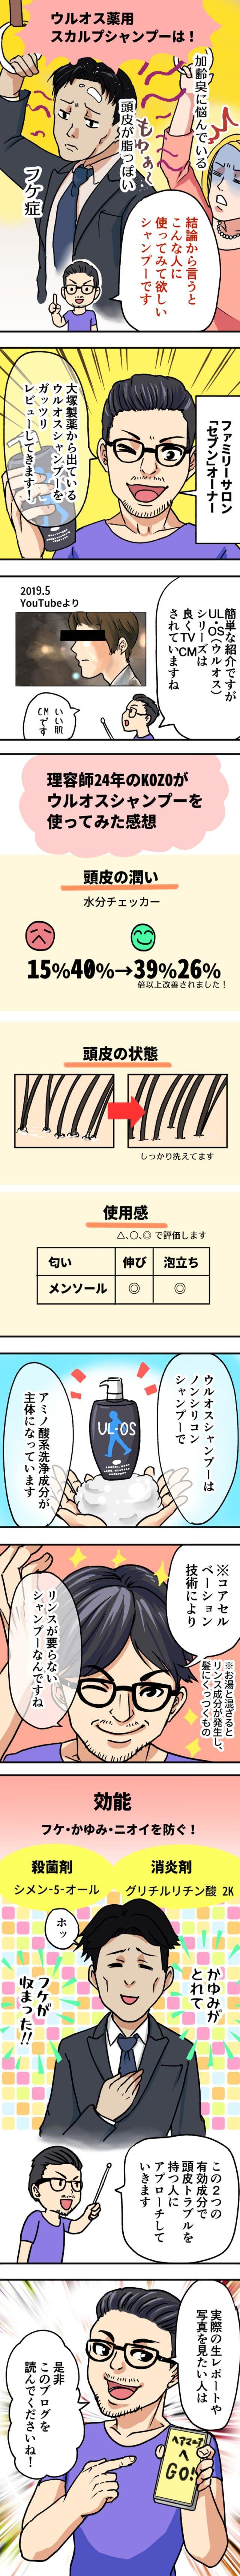 UL・OS(ウルオス)薬用スカルプシャンプーの効果口コミ!